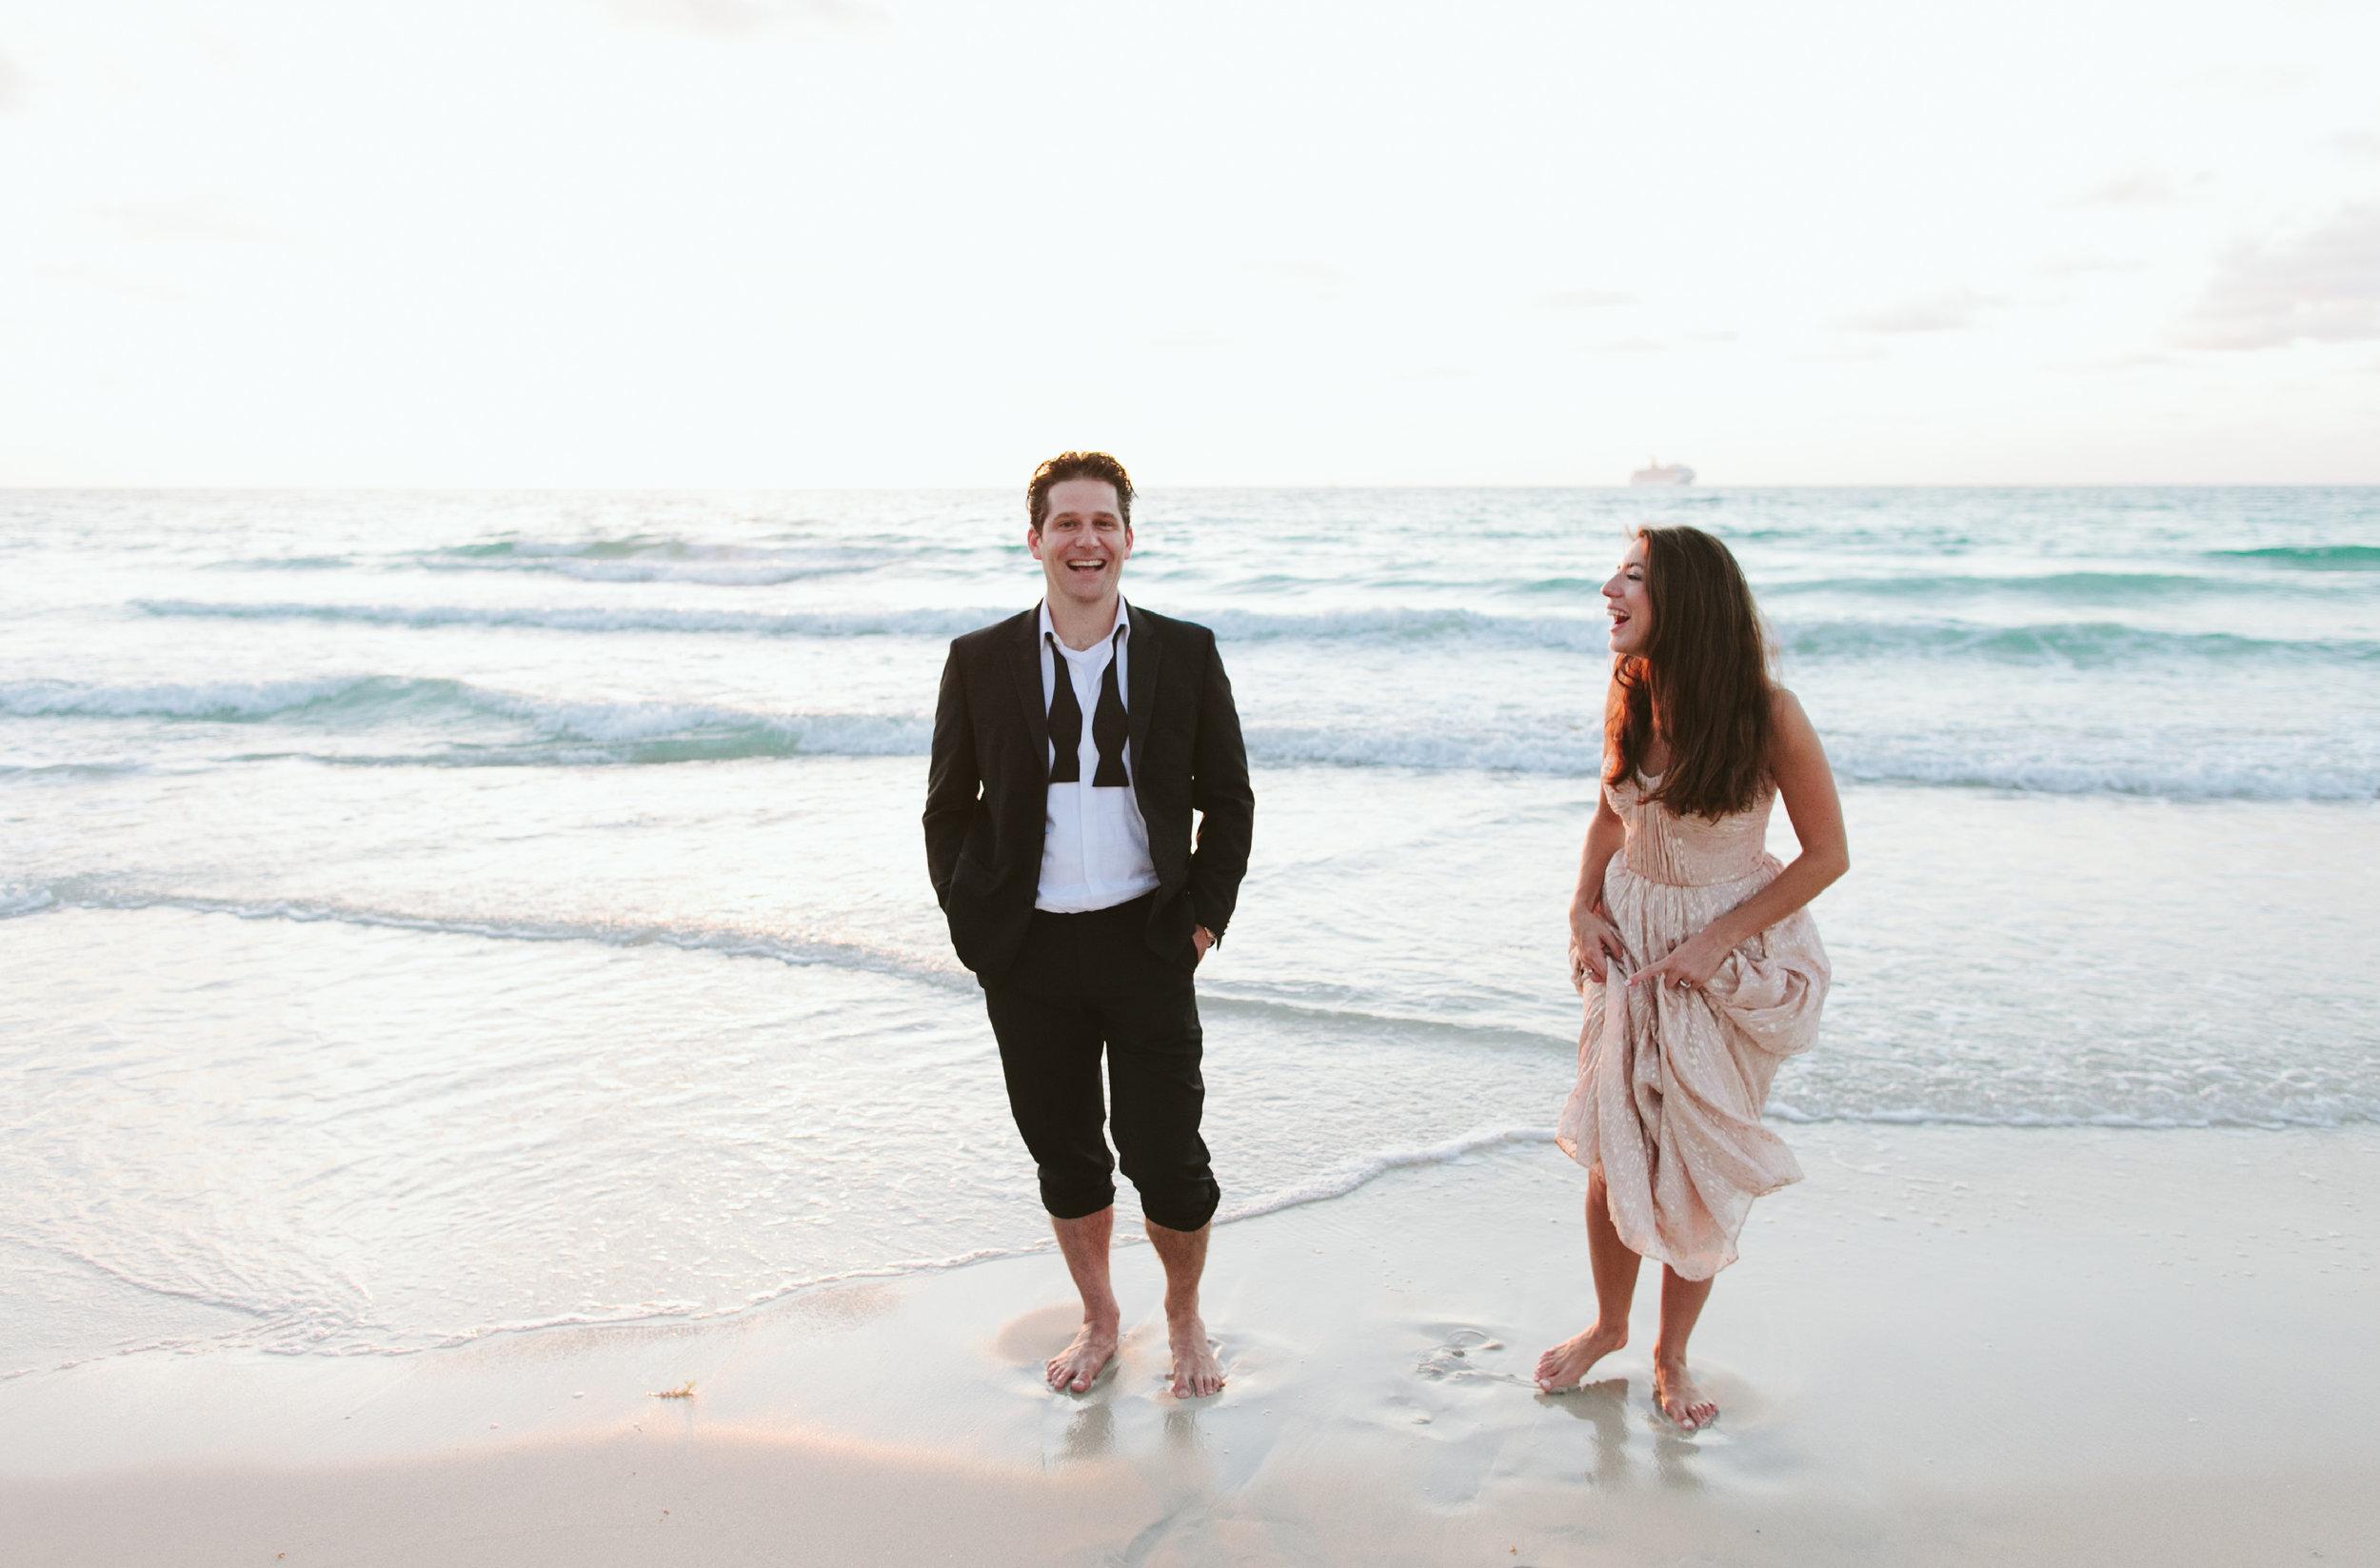 Meli + Mike South Pointe Park South Beach Miami Engagement Shoot19.jpg